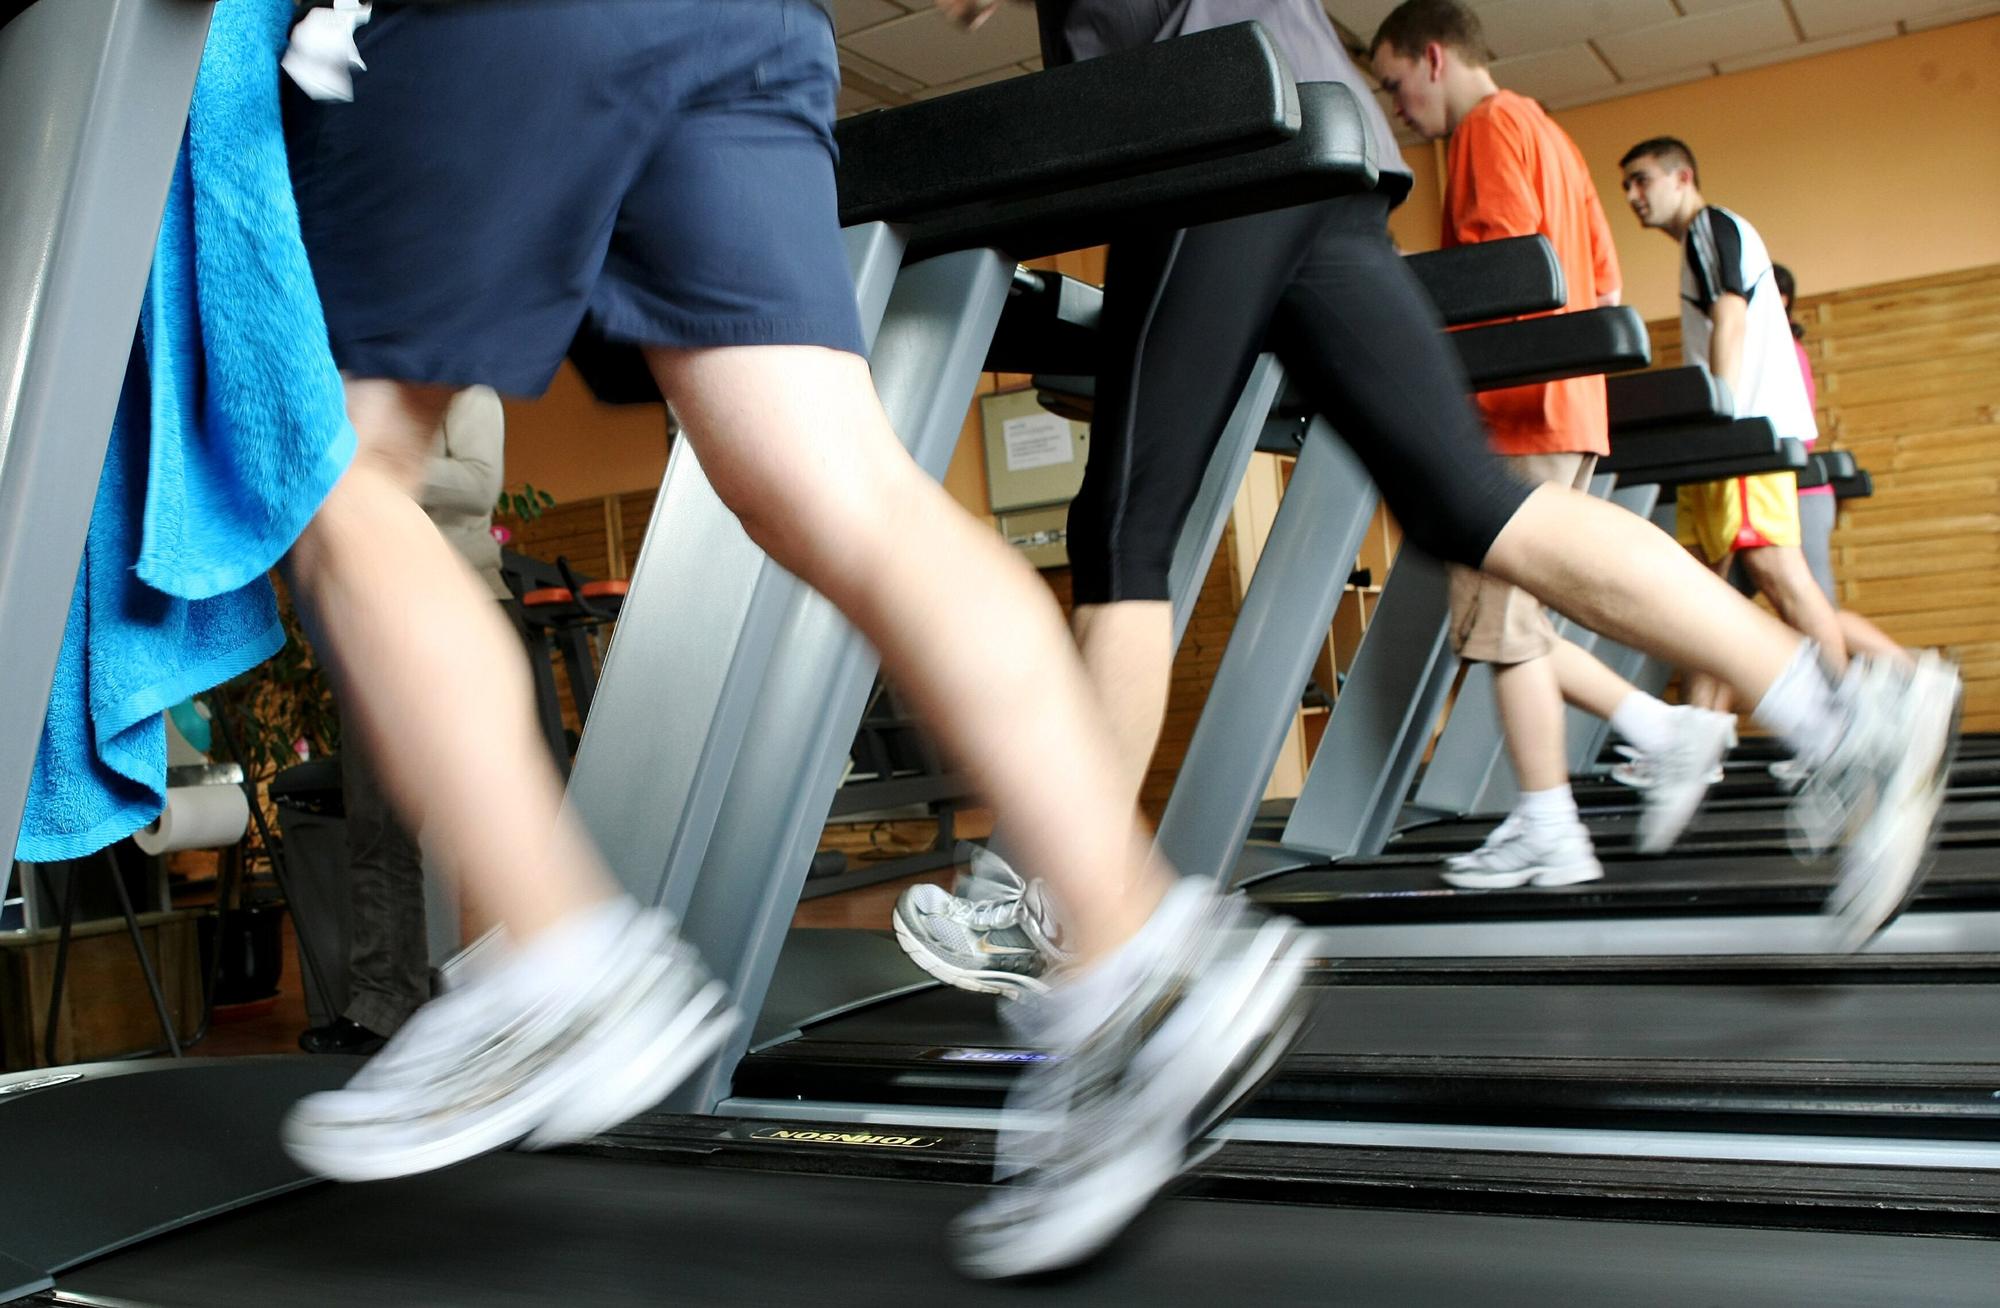 traening loeb halvmarathon smutveje til din foerste halvmarathon